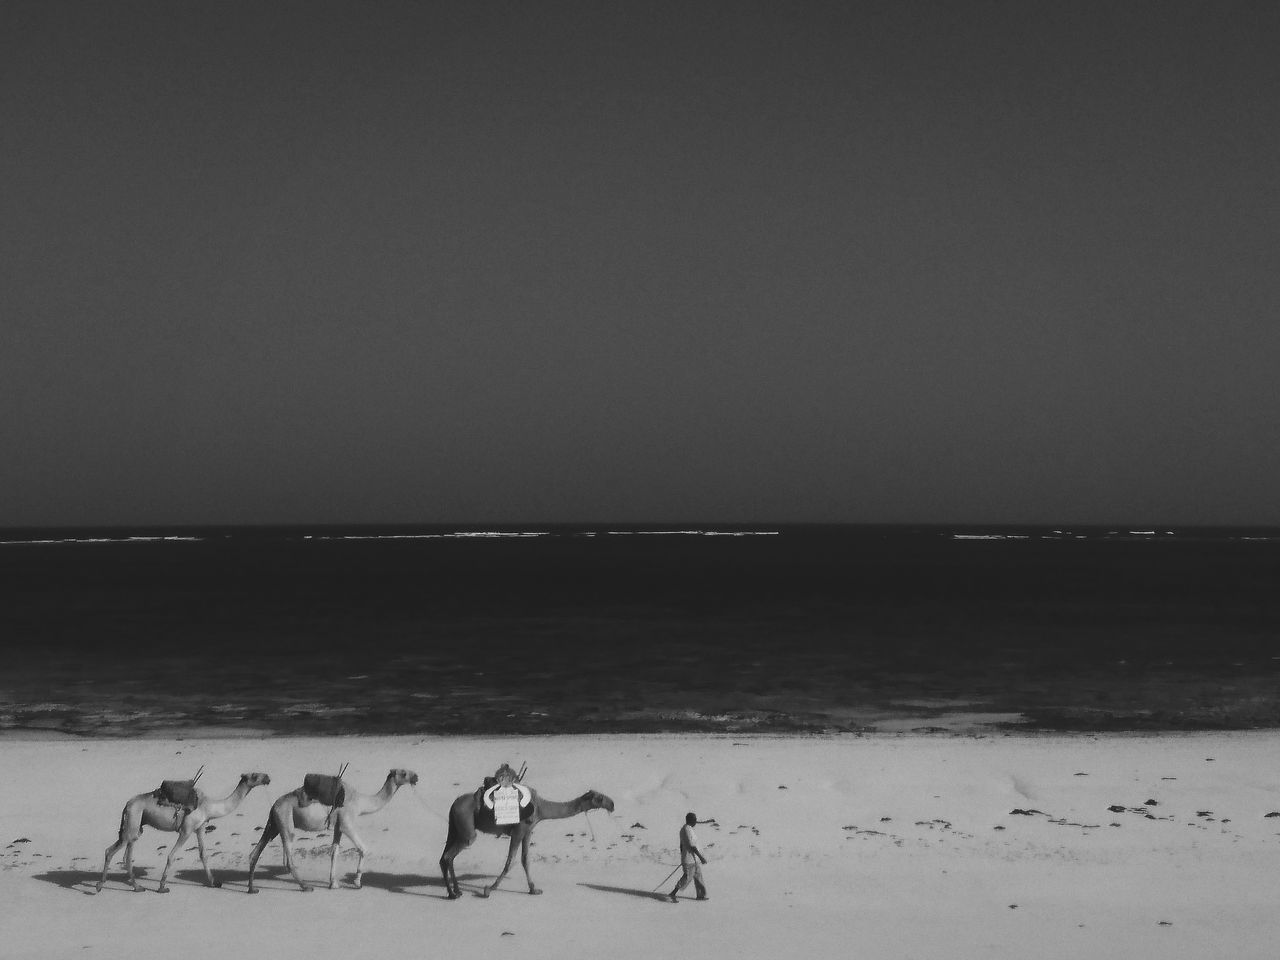 Diani Beach, Ukunda, Kenya. Animal Themes Animals In The Wild Animal Nature Beauty In Nature Camels Indian Ocean Ocean View Minimalism Minimal Landscape Adventure EyeEm Best Edits Beach Africa Animals Travel Destinations Kenya VSCO EyeEm Best Shots The Great Outdoors - 2017 EyeEm Awards